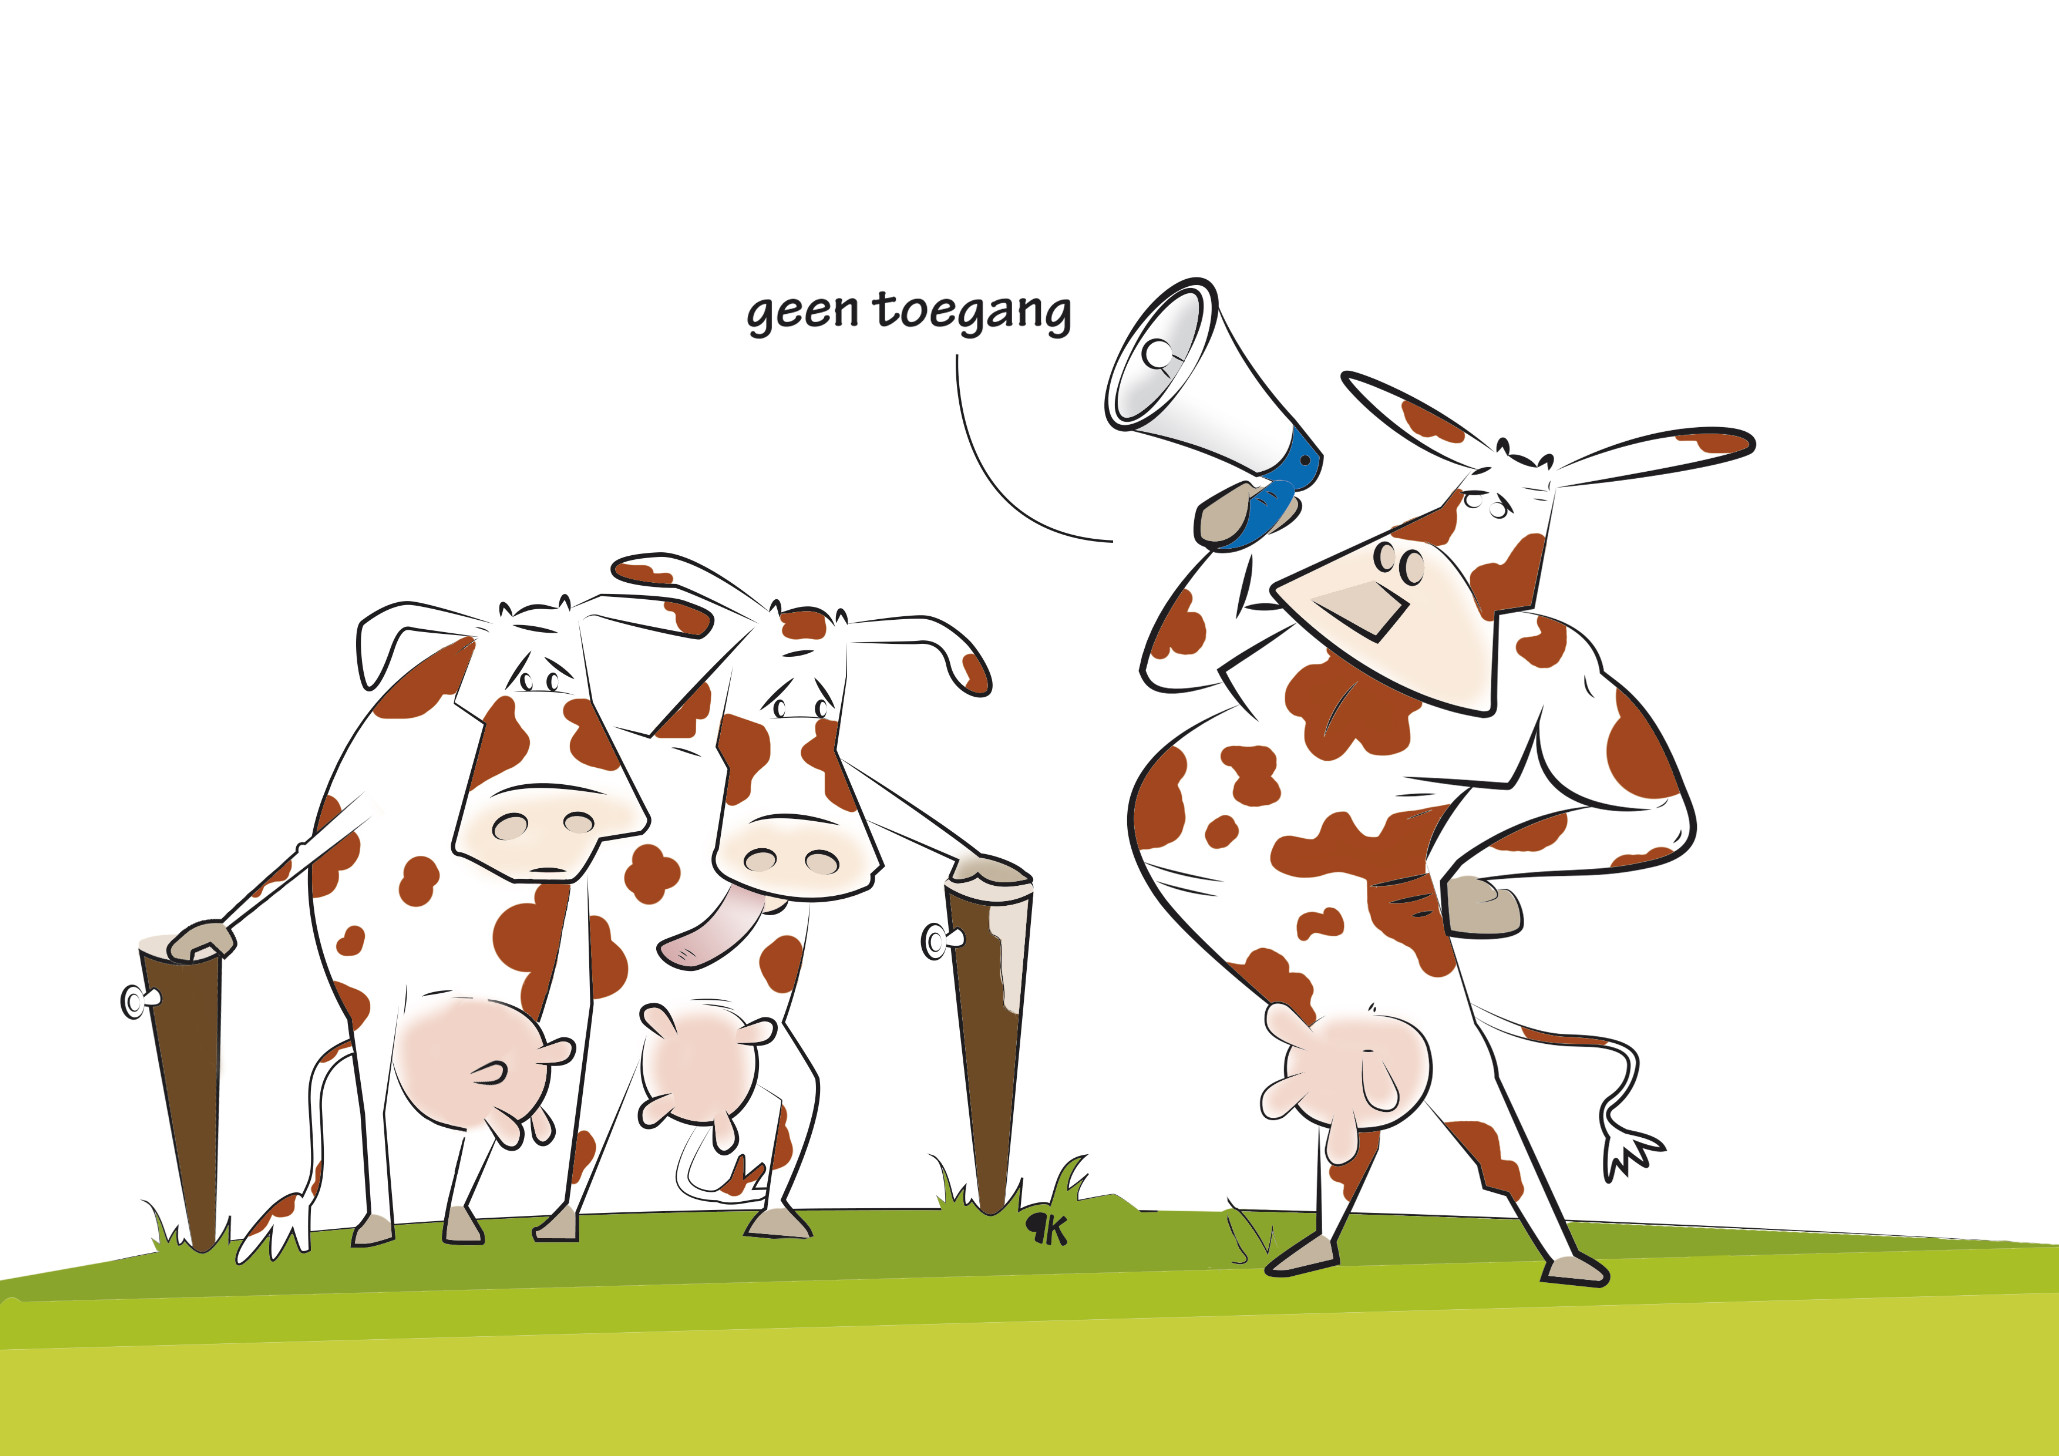 'Een mooie sterke koe, daar word ik blij van'